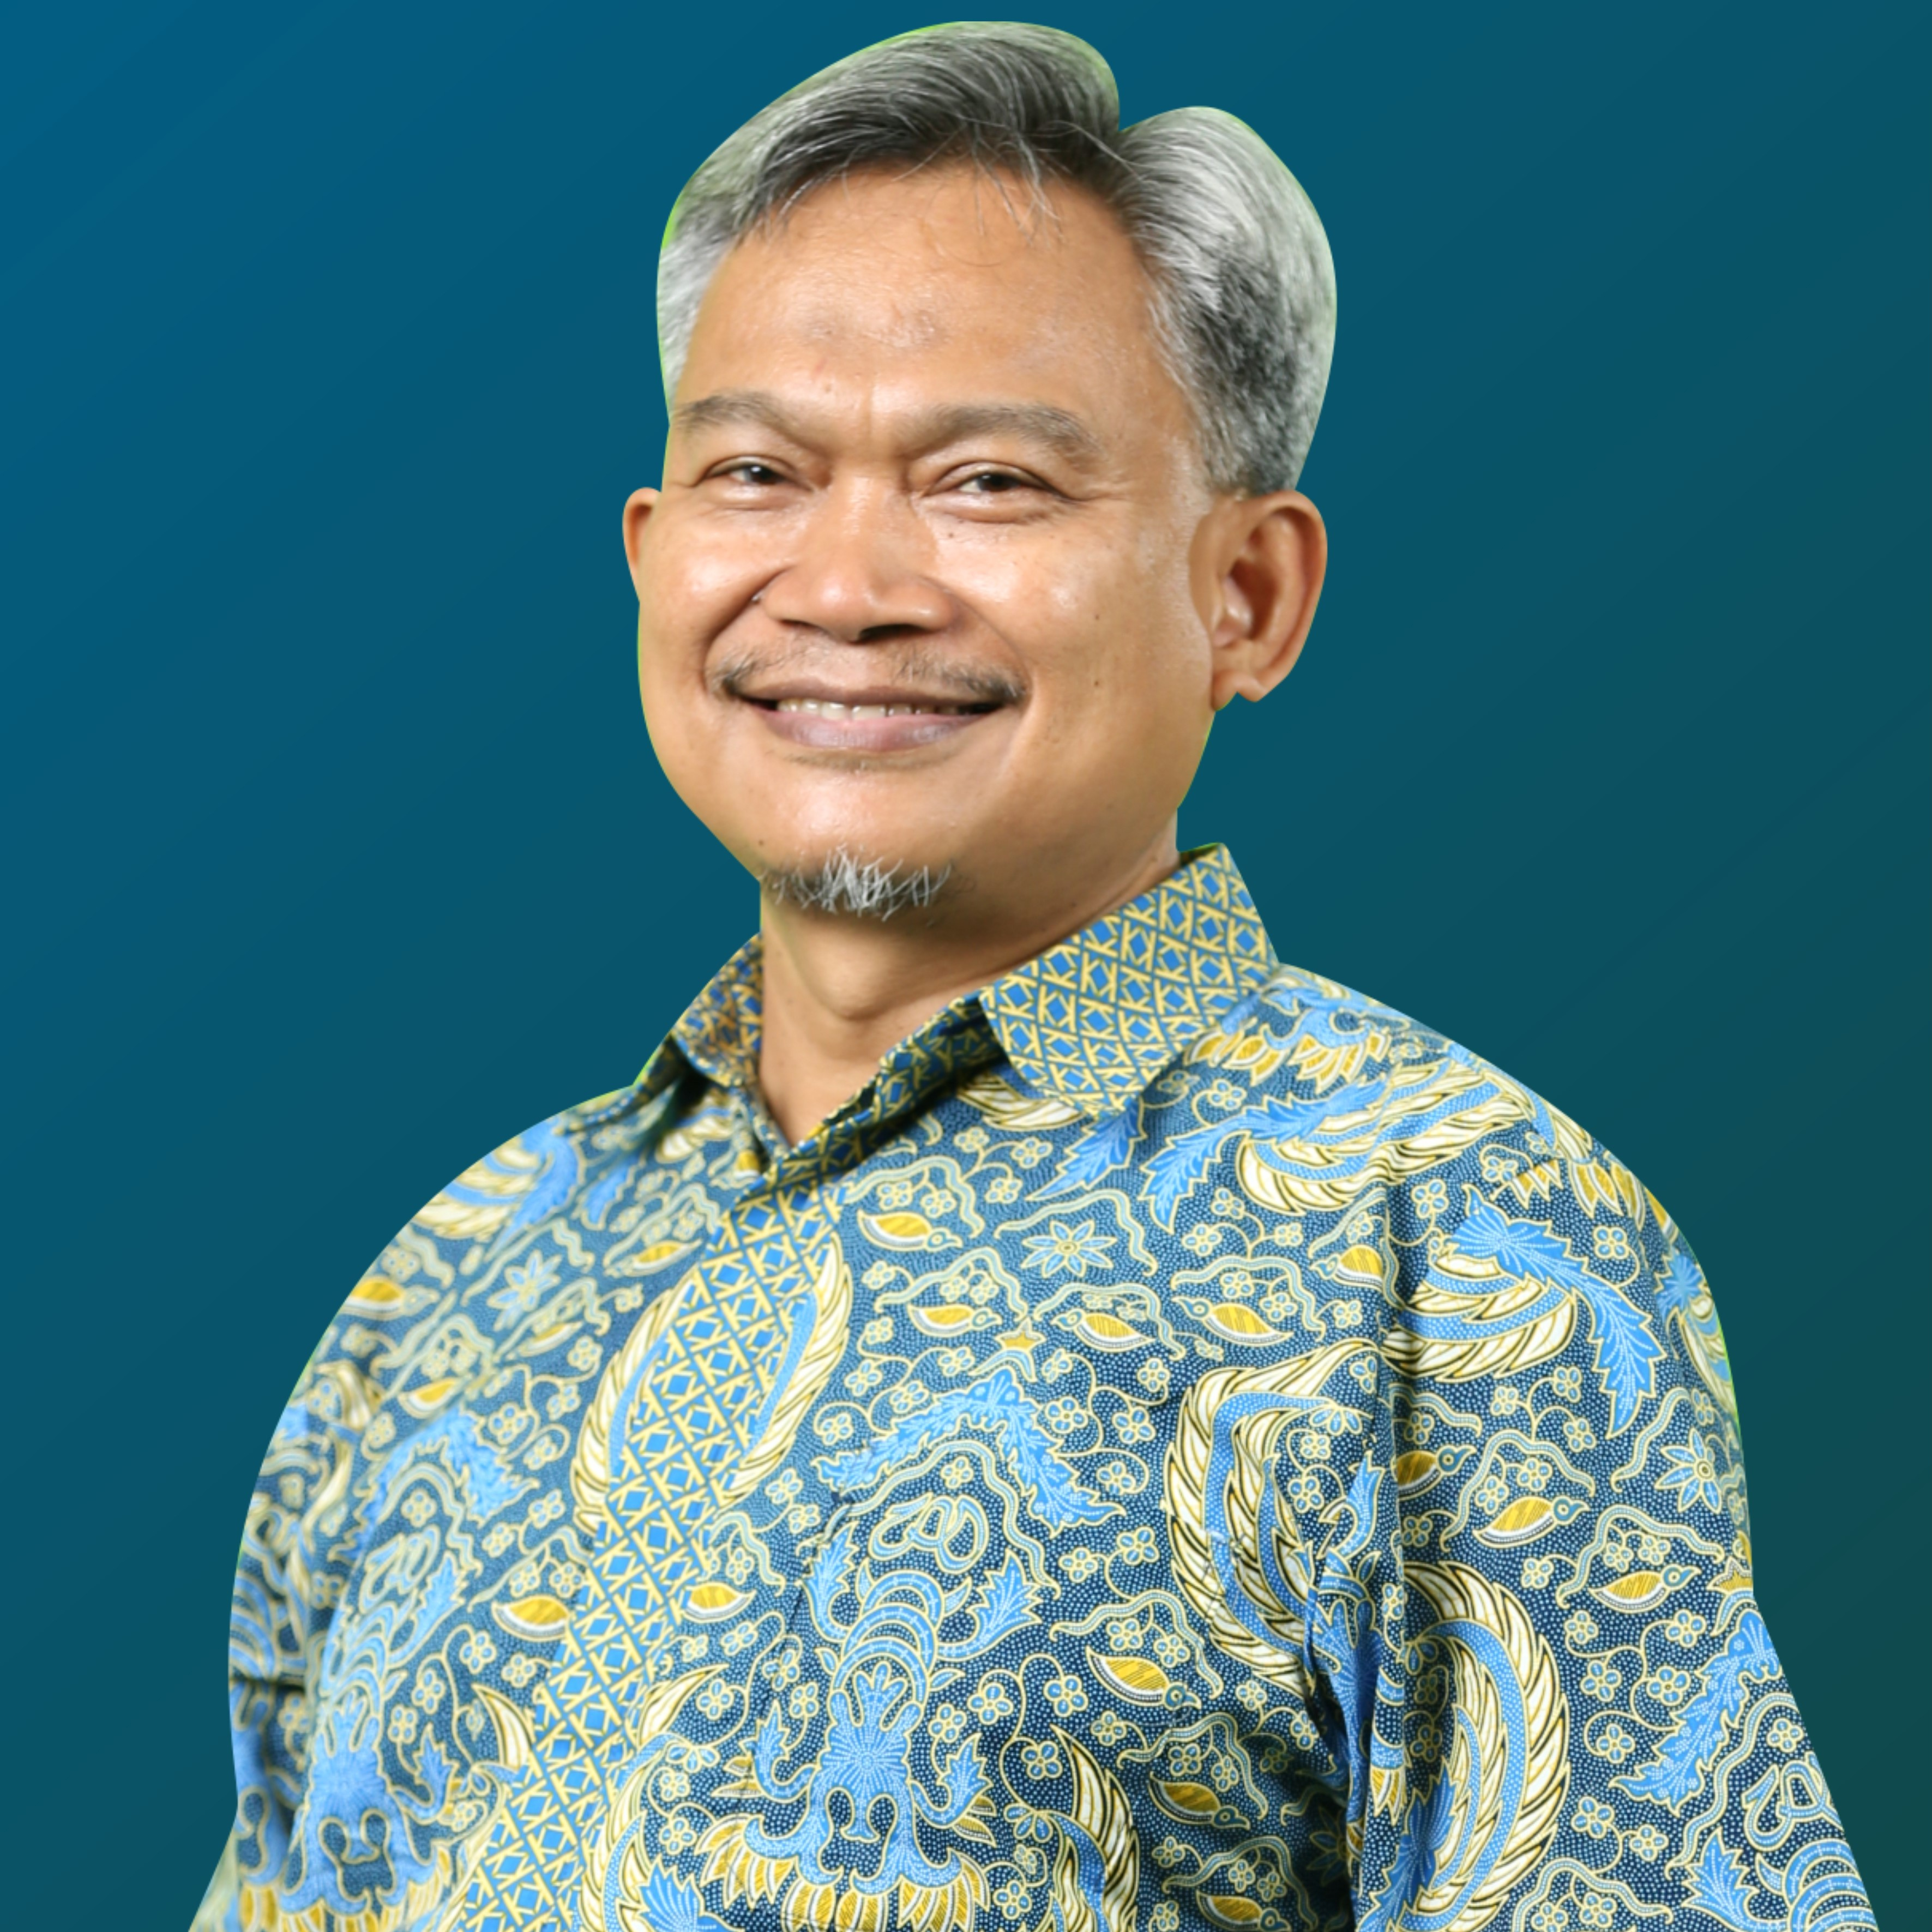 Drs. Bambang Widi Pratolo, M.Hum., Ph.D.